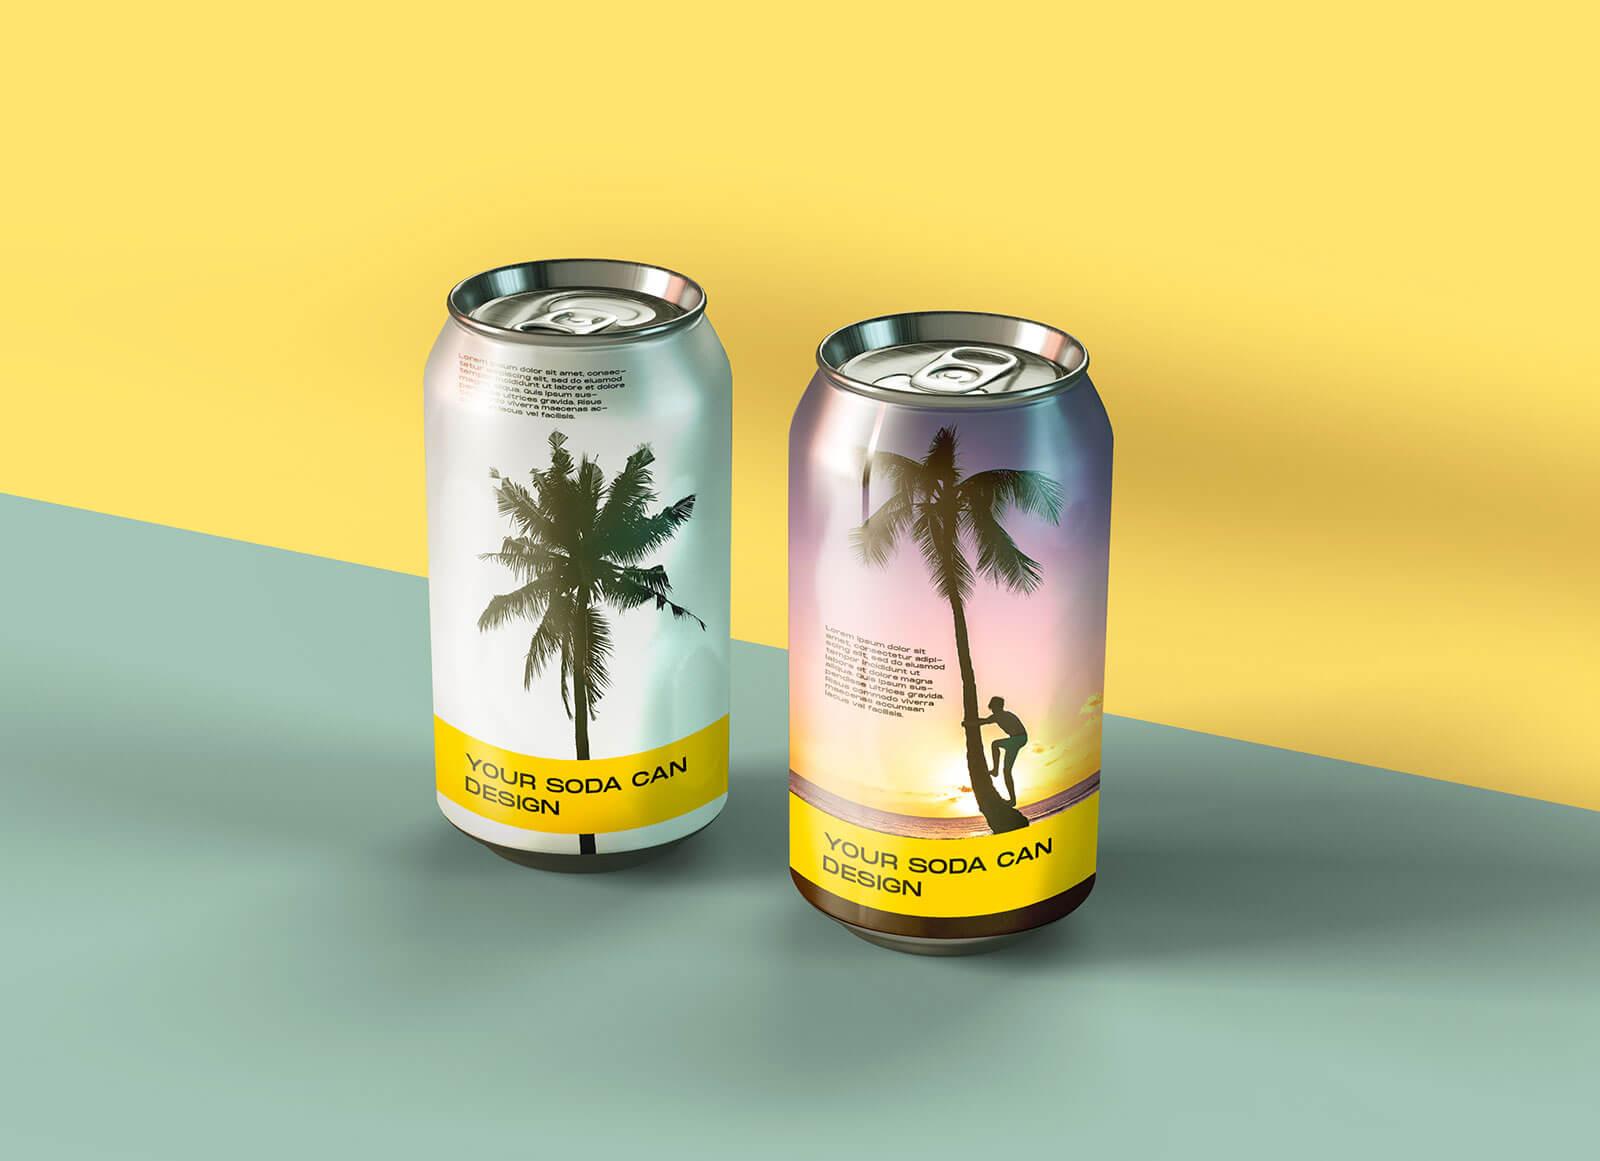 Free-Duplicate-Soda-Can-Mockup-PSD